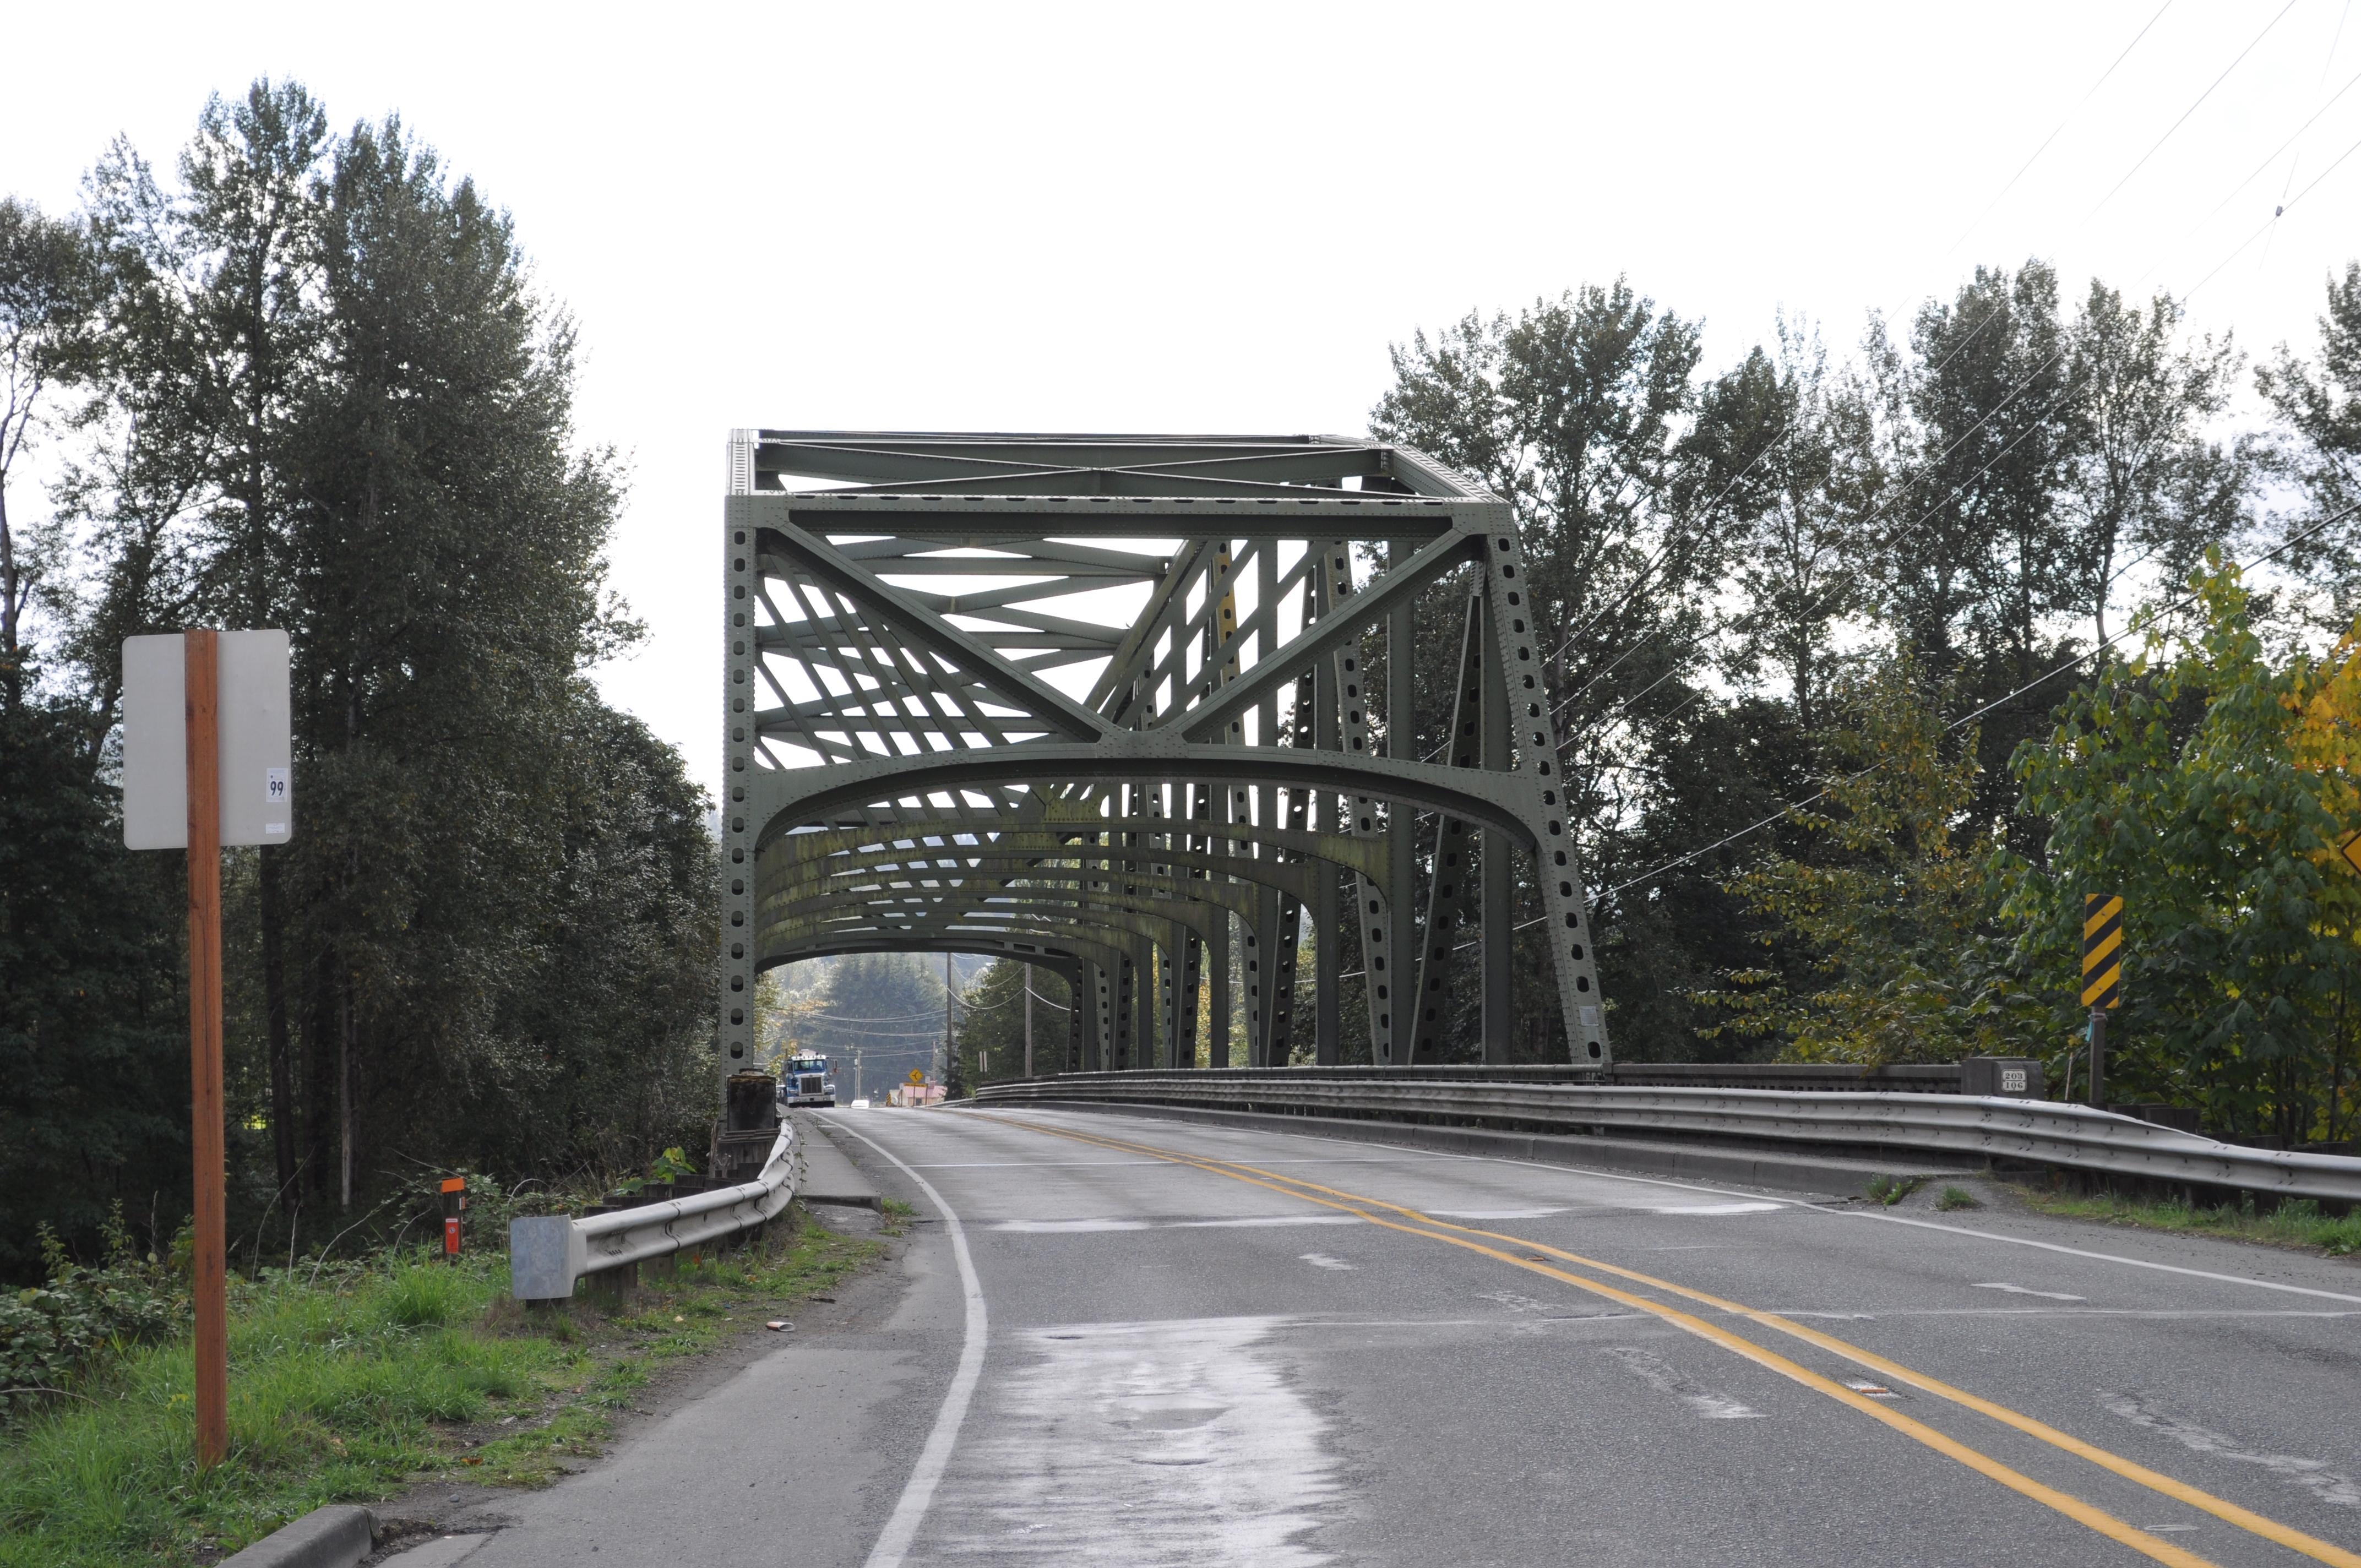 File:Monroe, WA - Lewis Street Bridge 02.jpg